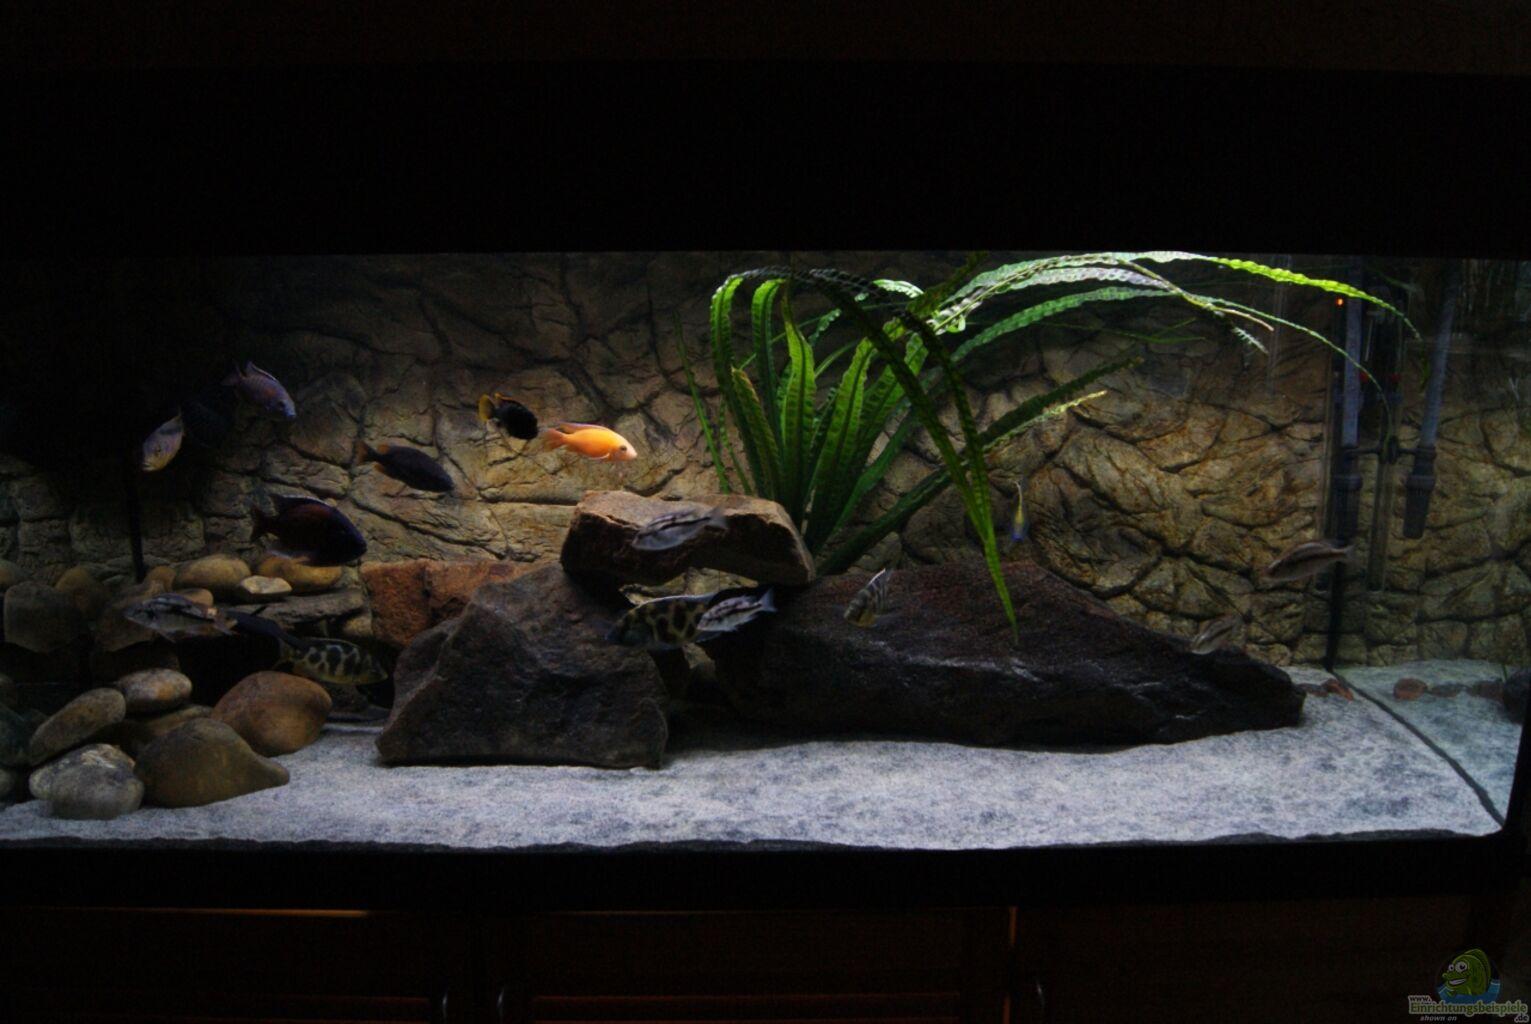 aquarium von sascha g malawimix. Black Bedroom Furniture Sets. Home Design Ideas